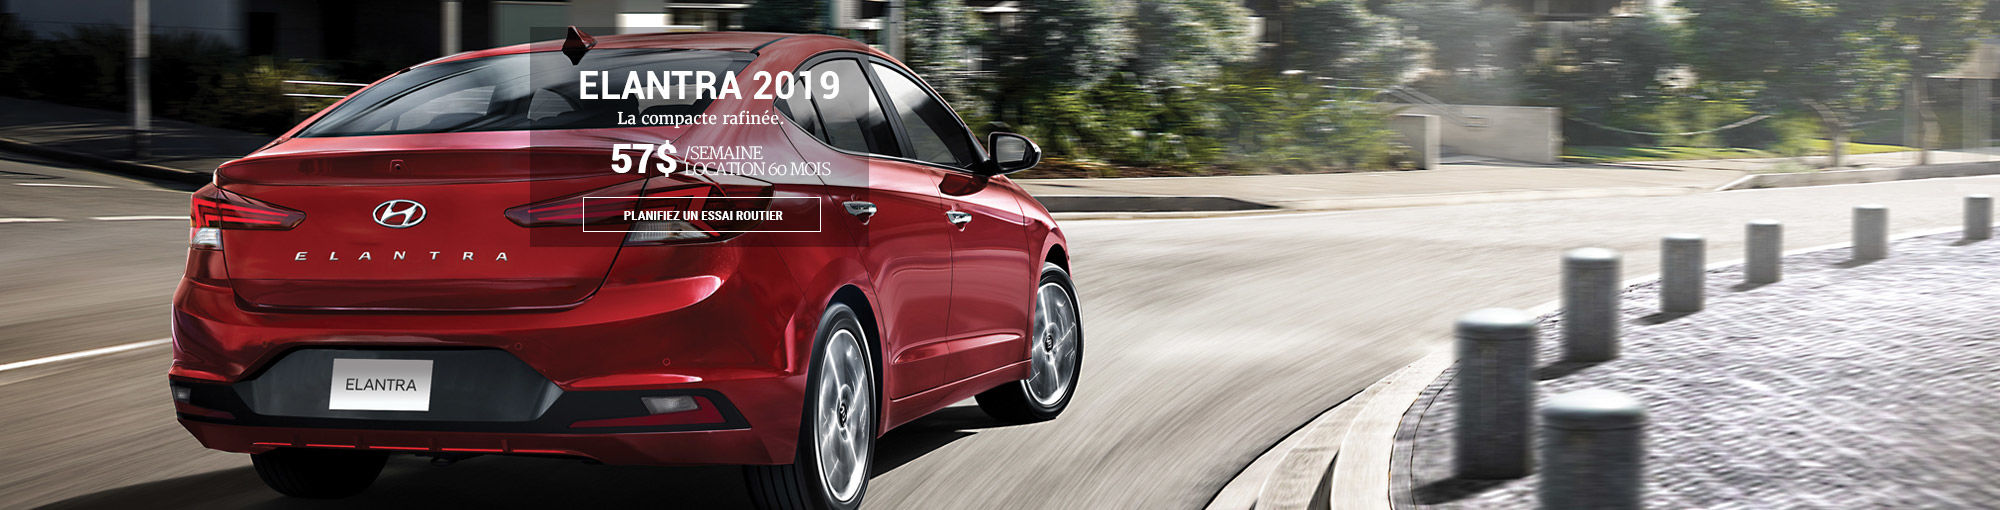 Hyundai elantra header 2019-  JANVIER